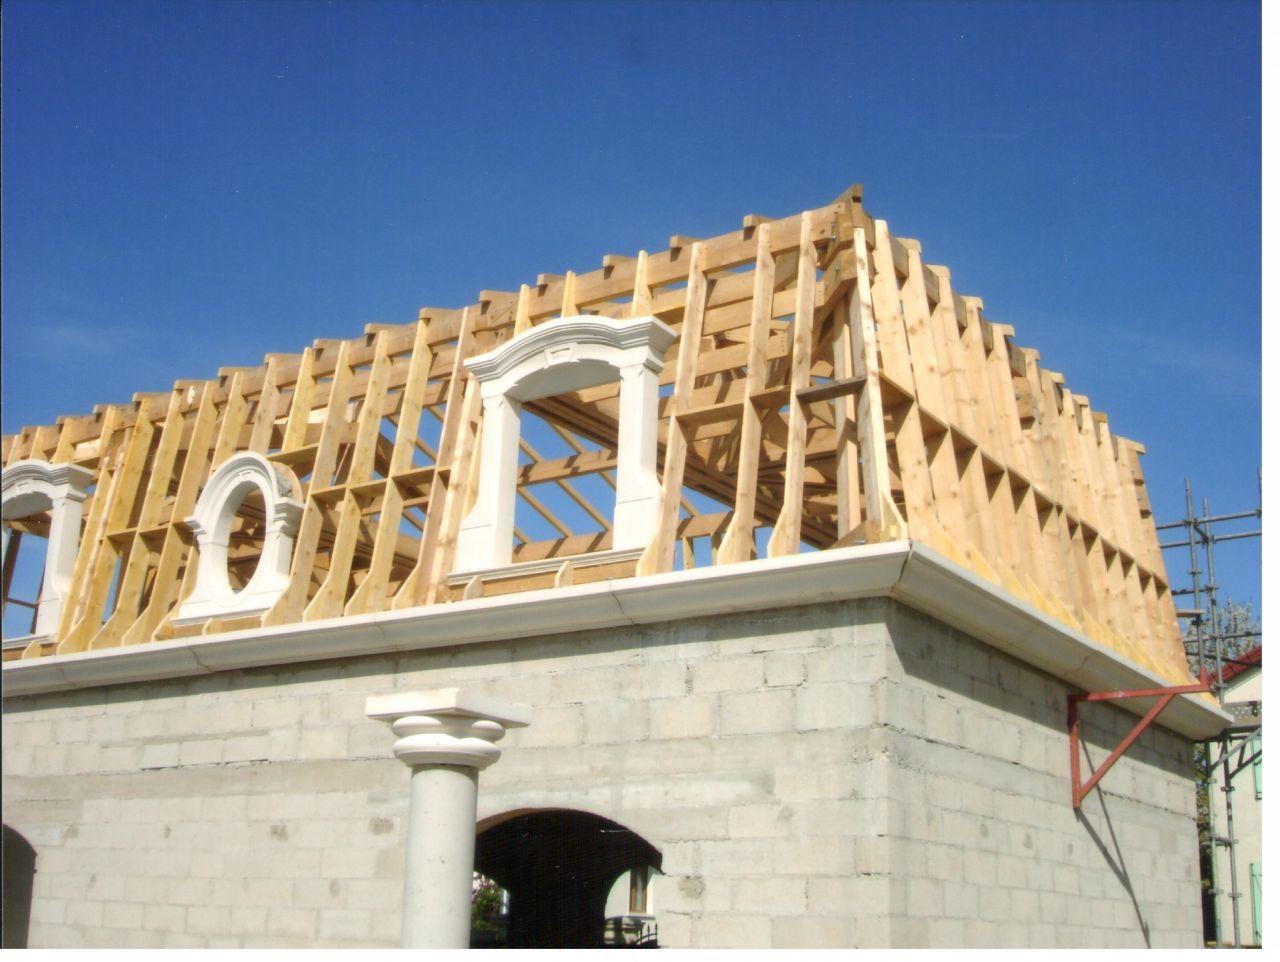 Toit Mansard In 2019 Mansard Roof Gambrel Roof Roof Design